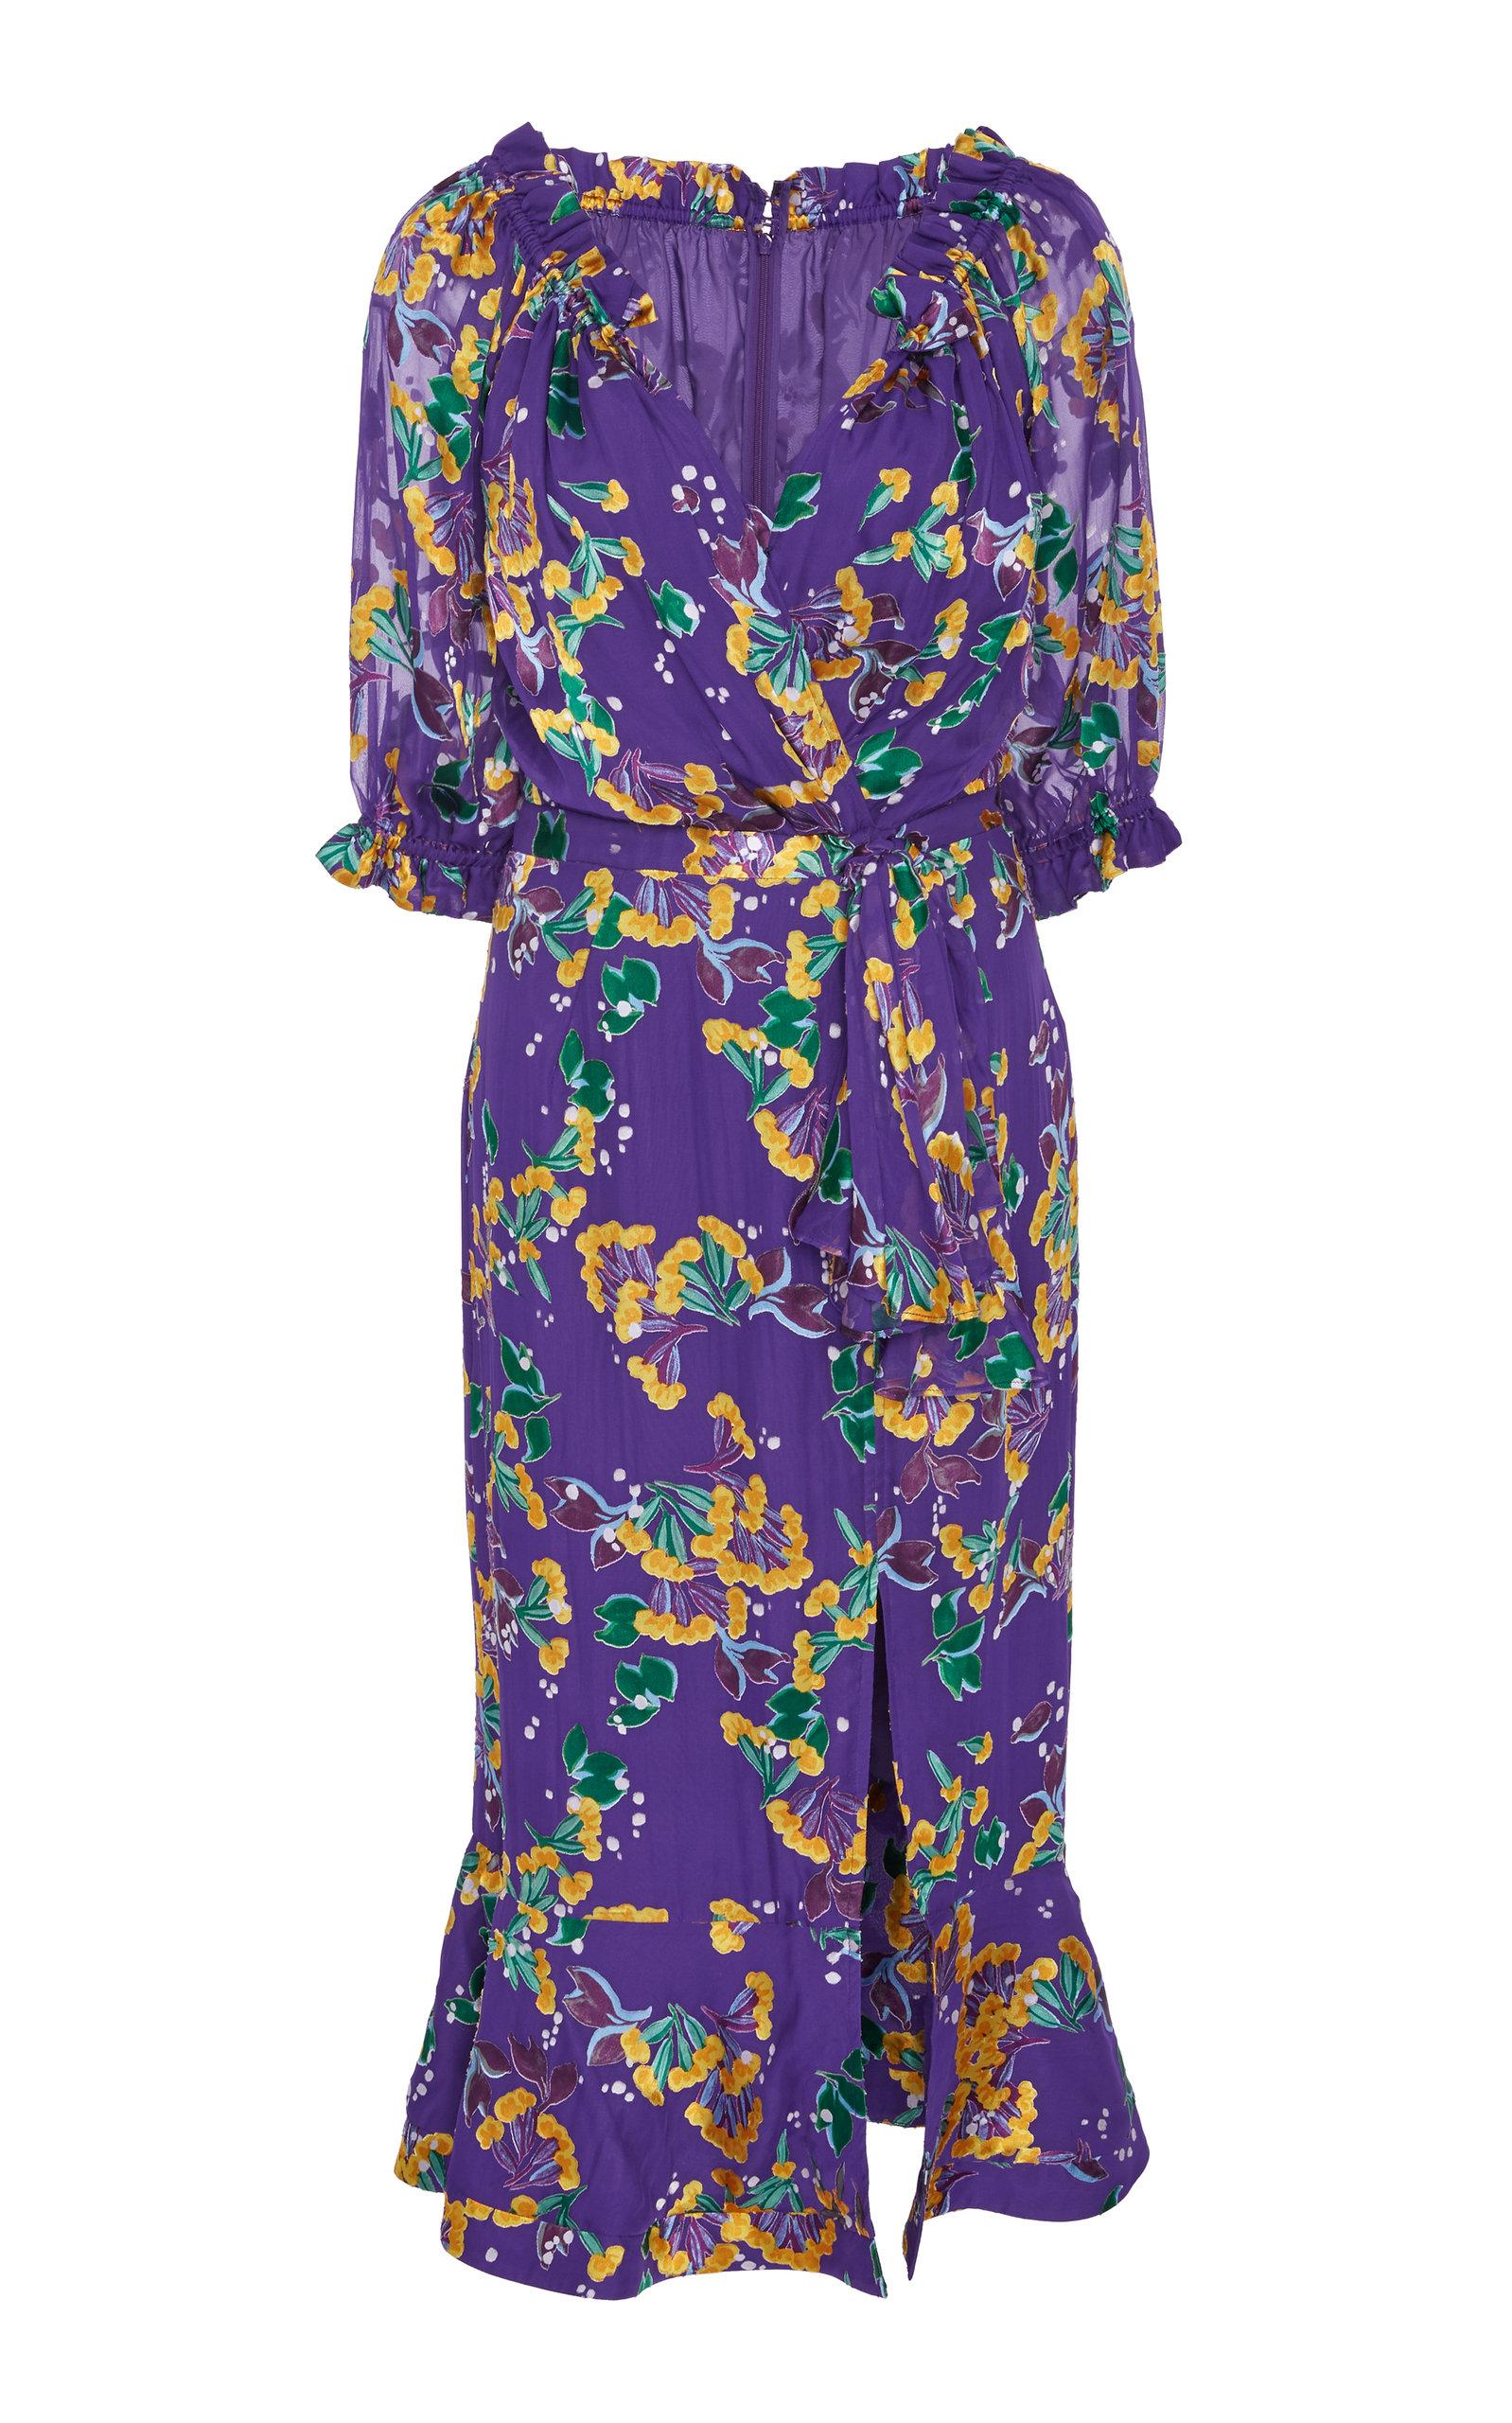 a65a6ee31c4d3 SaloniOlivia Ruffled Floral-Print Silk-Chiffon Midi Dress. CLOSE. Loading